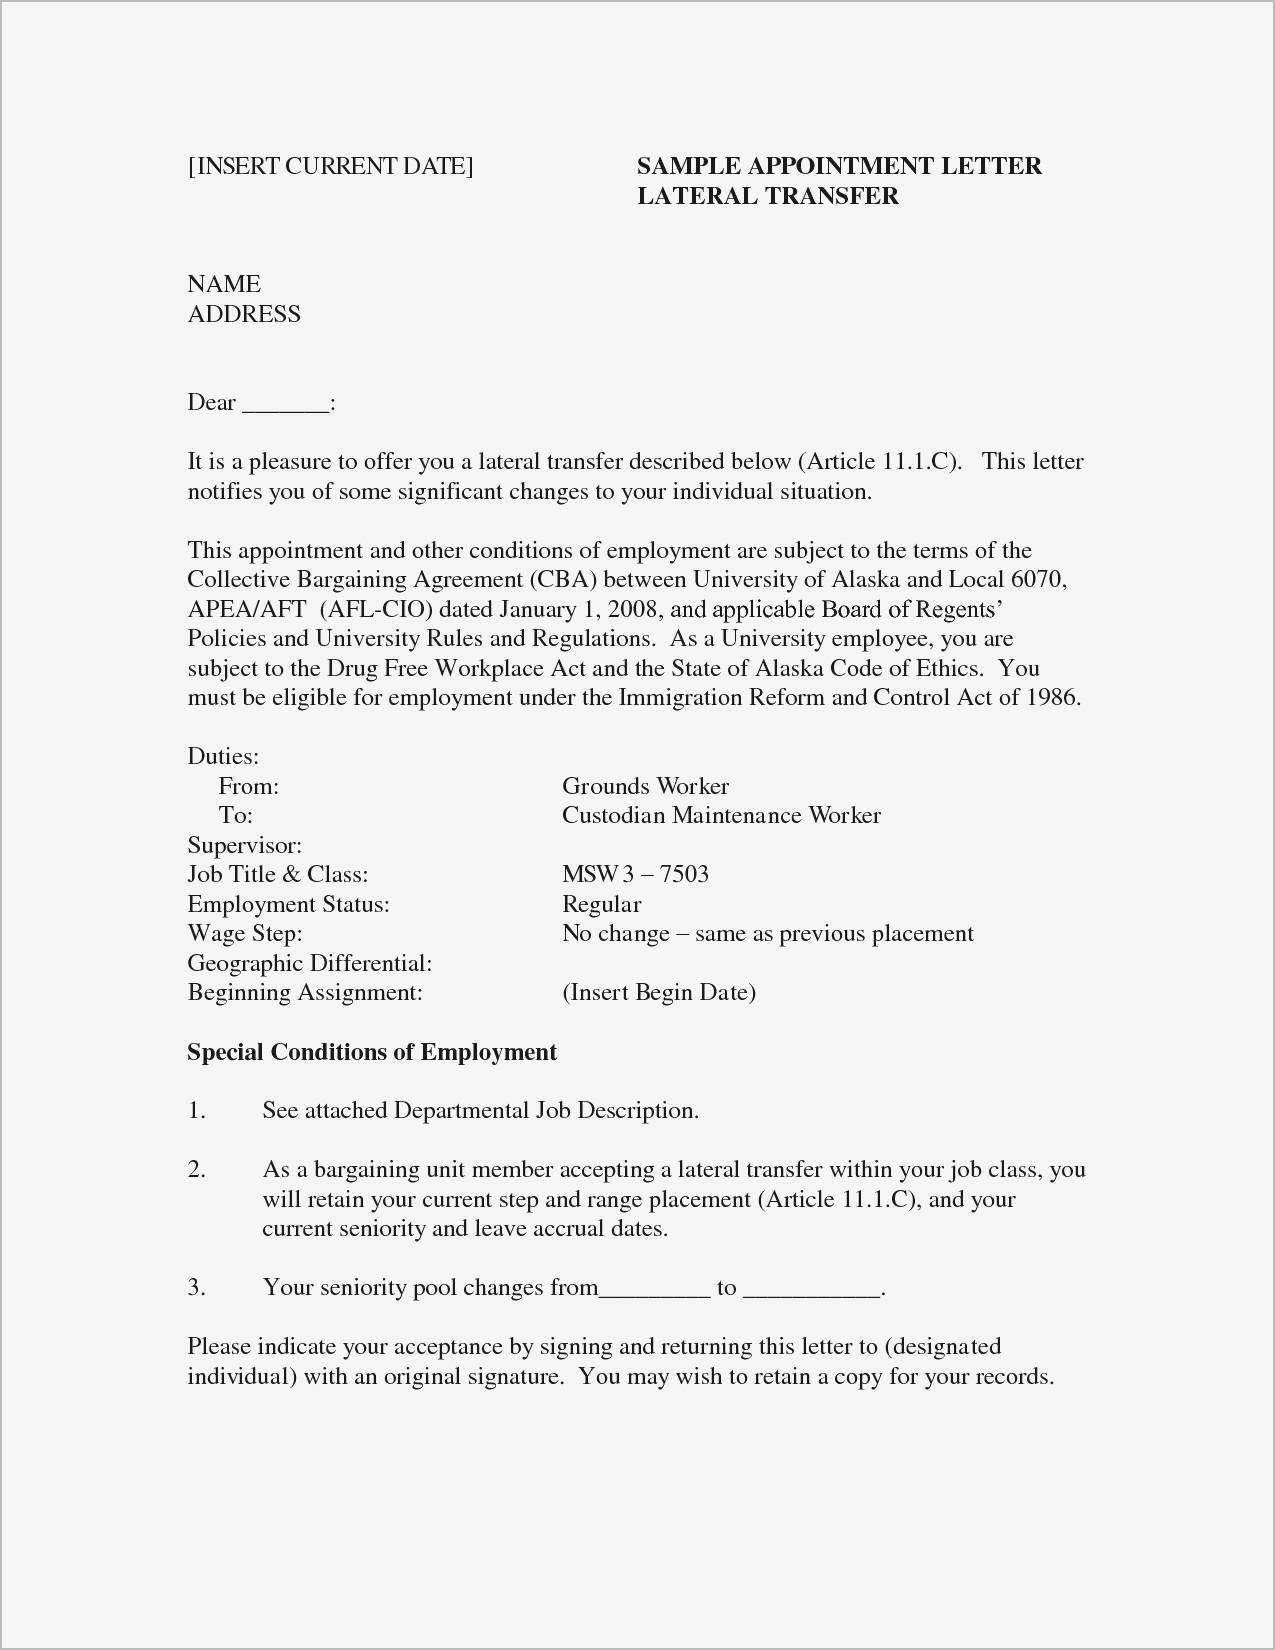 Graphic Design Cover Letter Template - Graphic Design Cover Letter Examples Samples